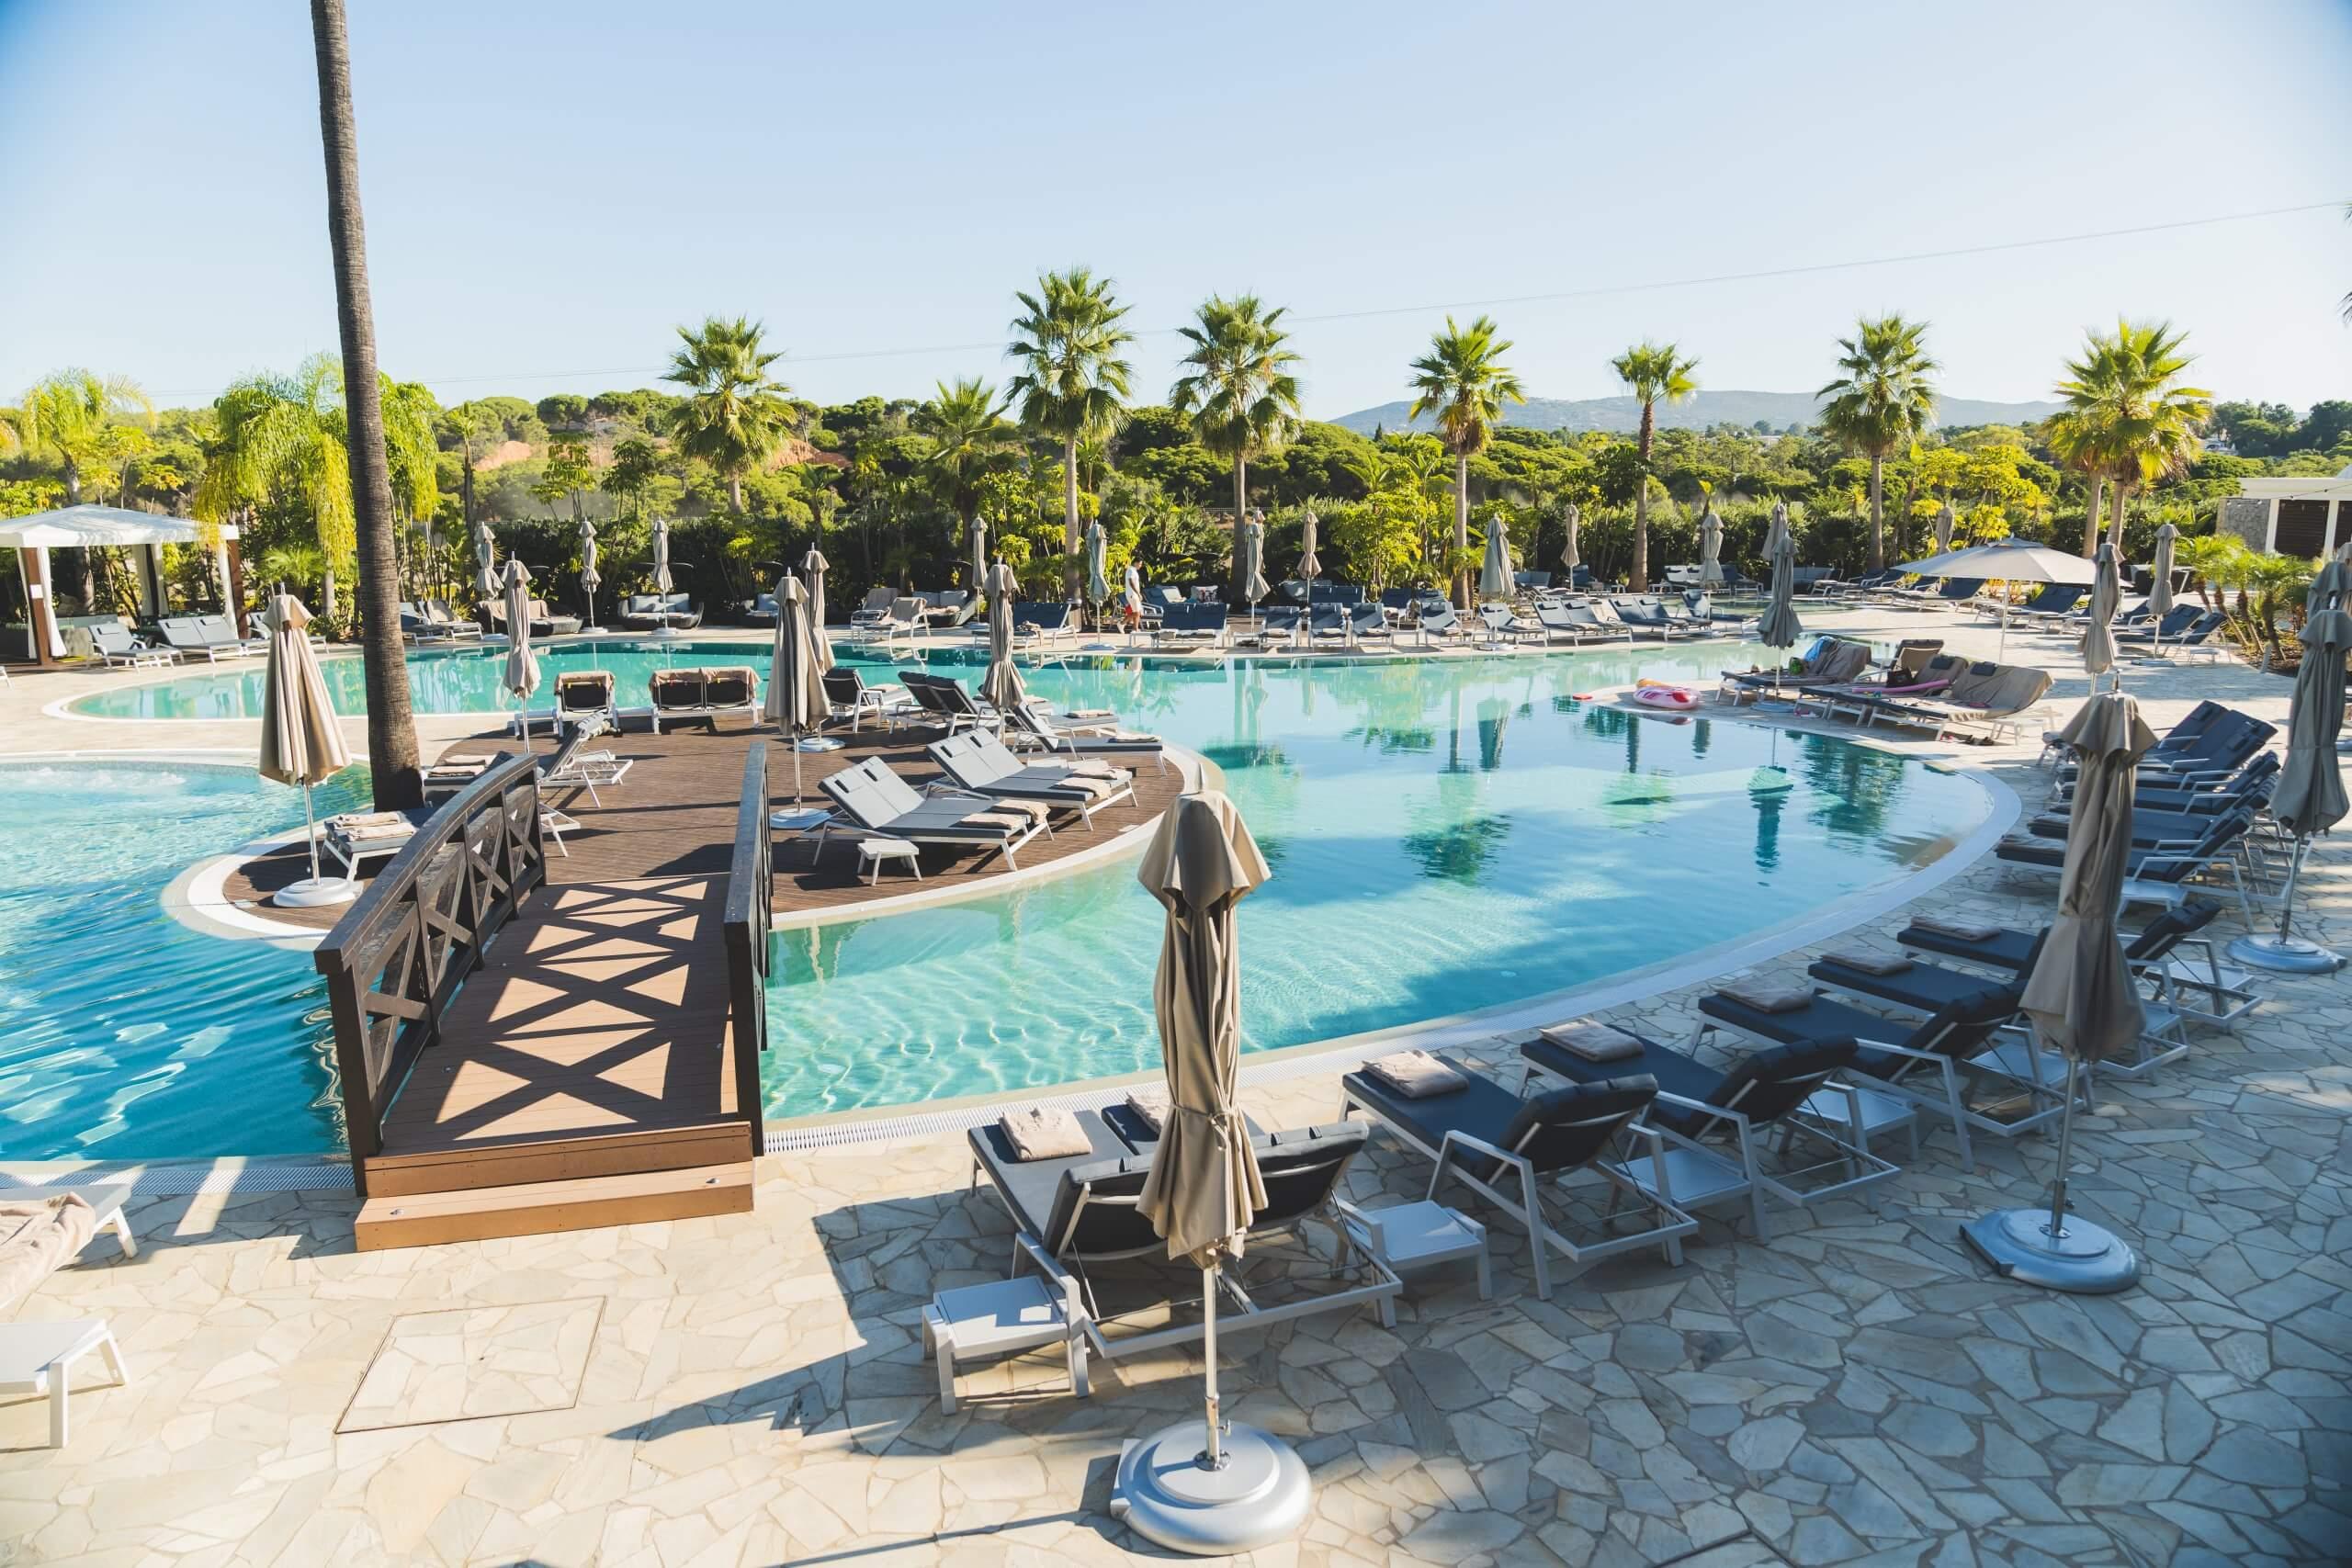 Sensations Pool, Resort Conrad Algarve, Quinta do Lago